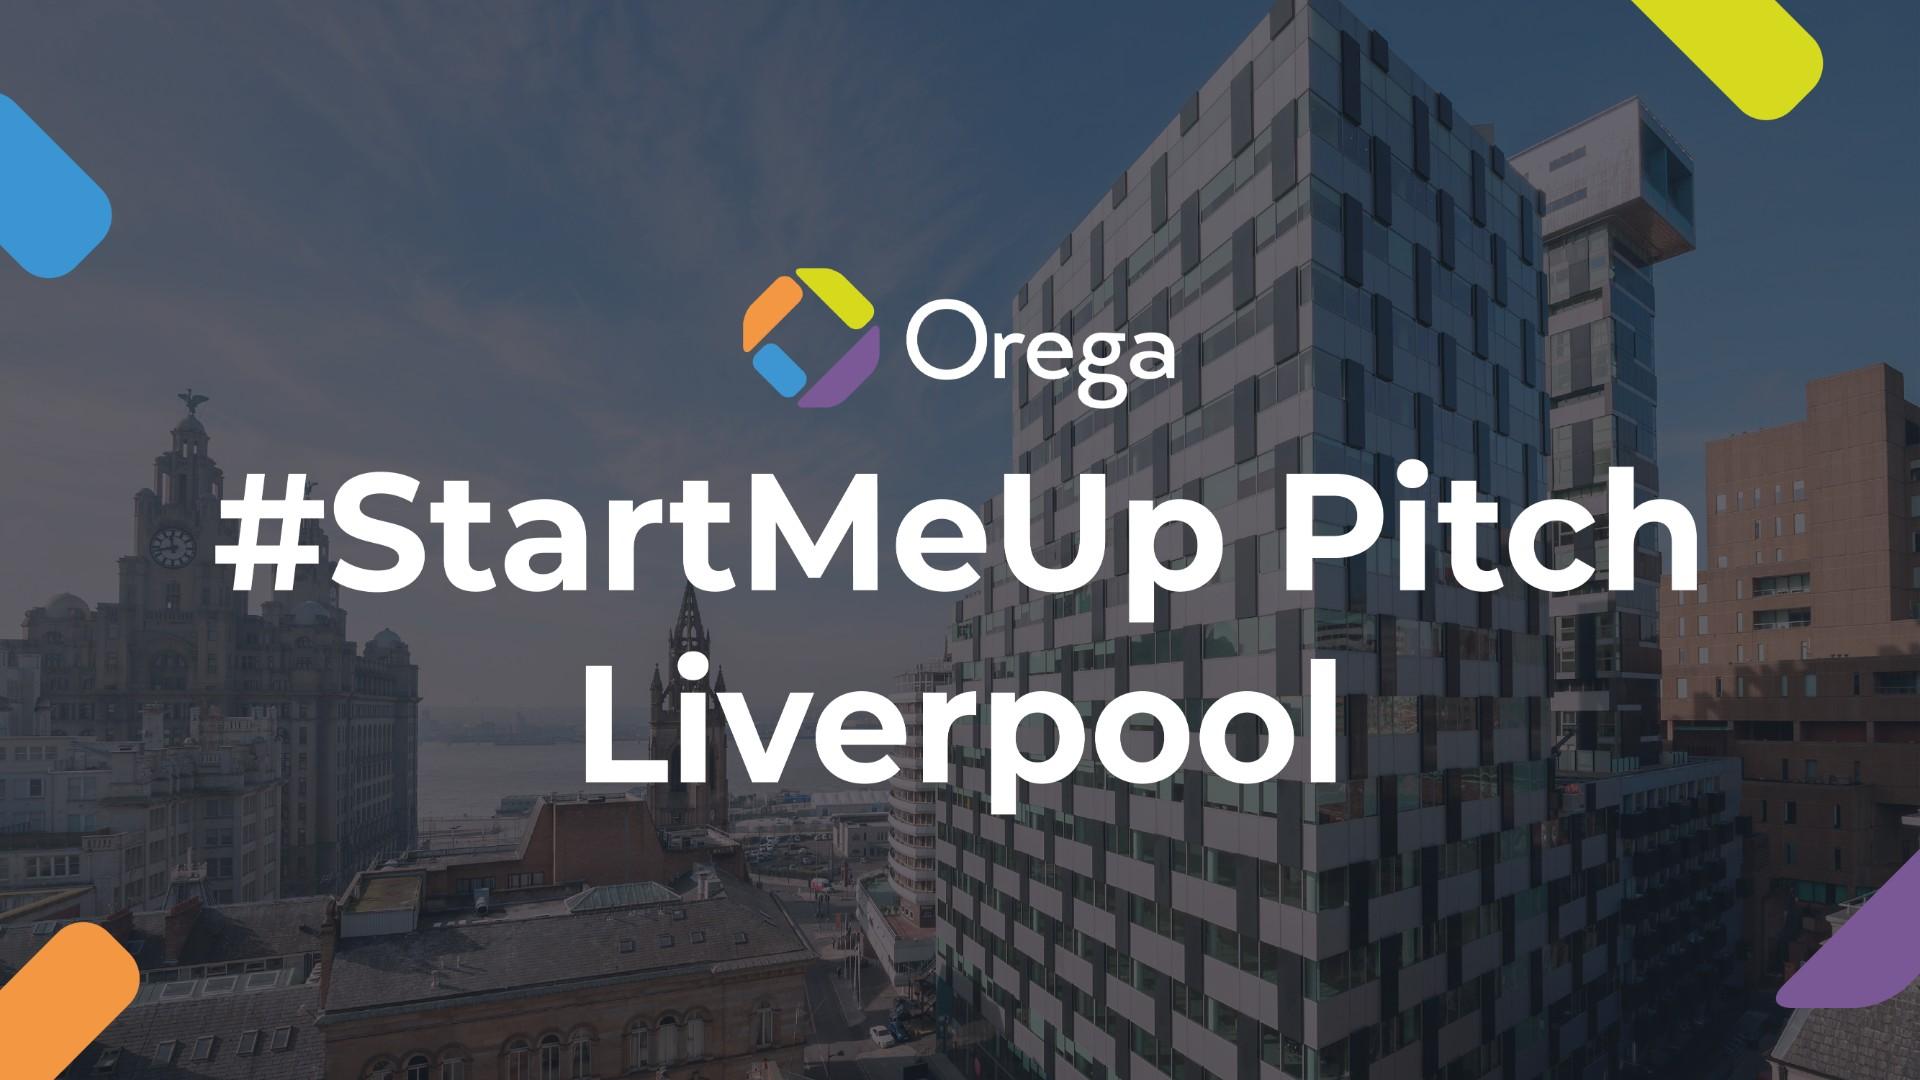 StartMeUp Liverpool - Resources